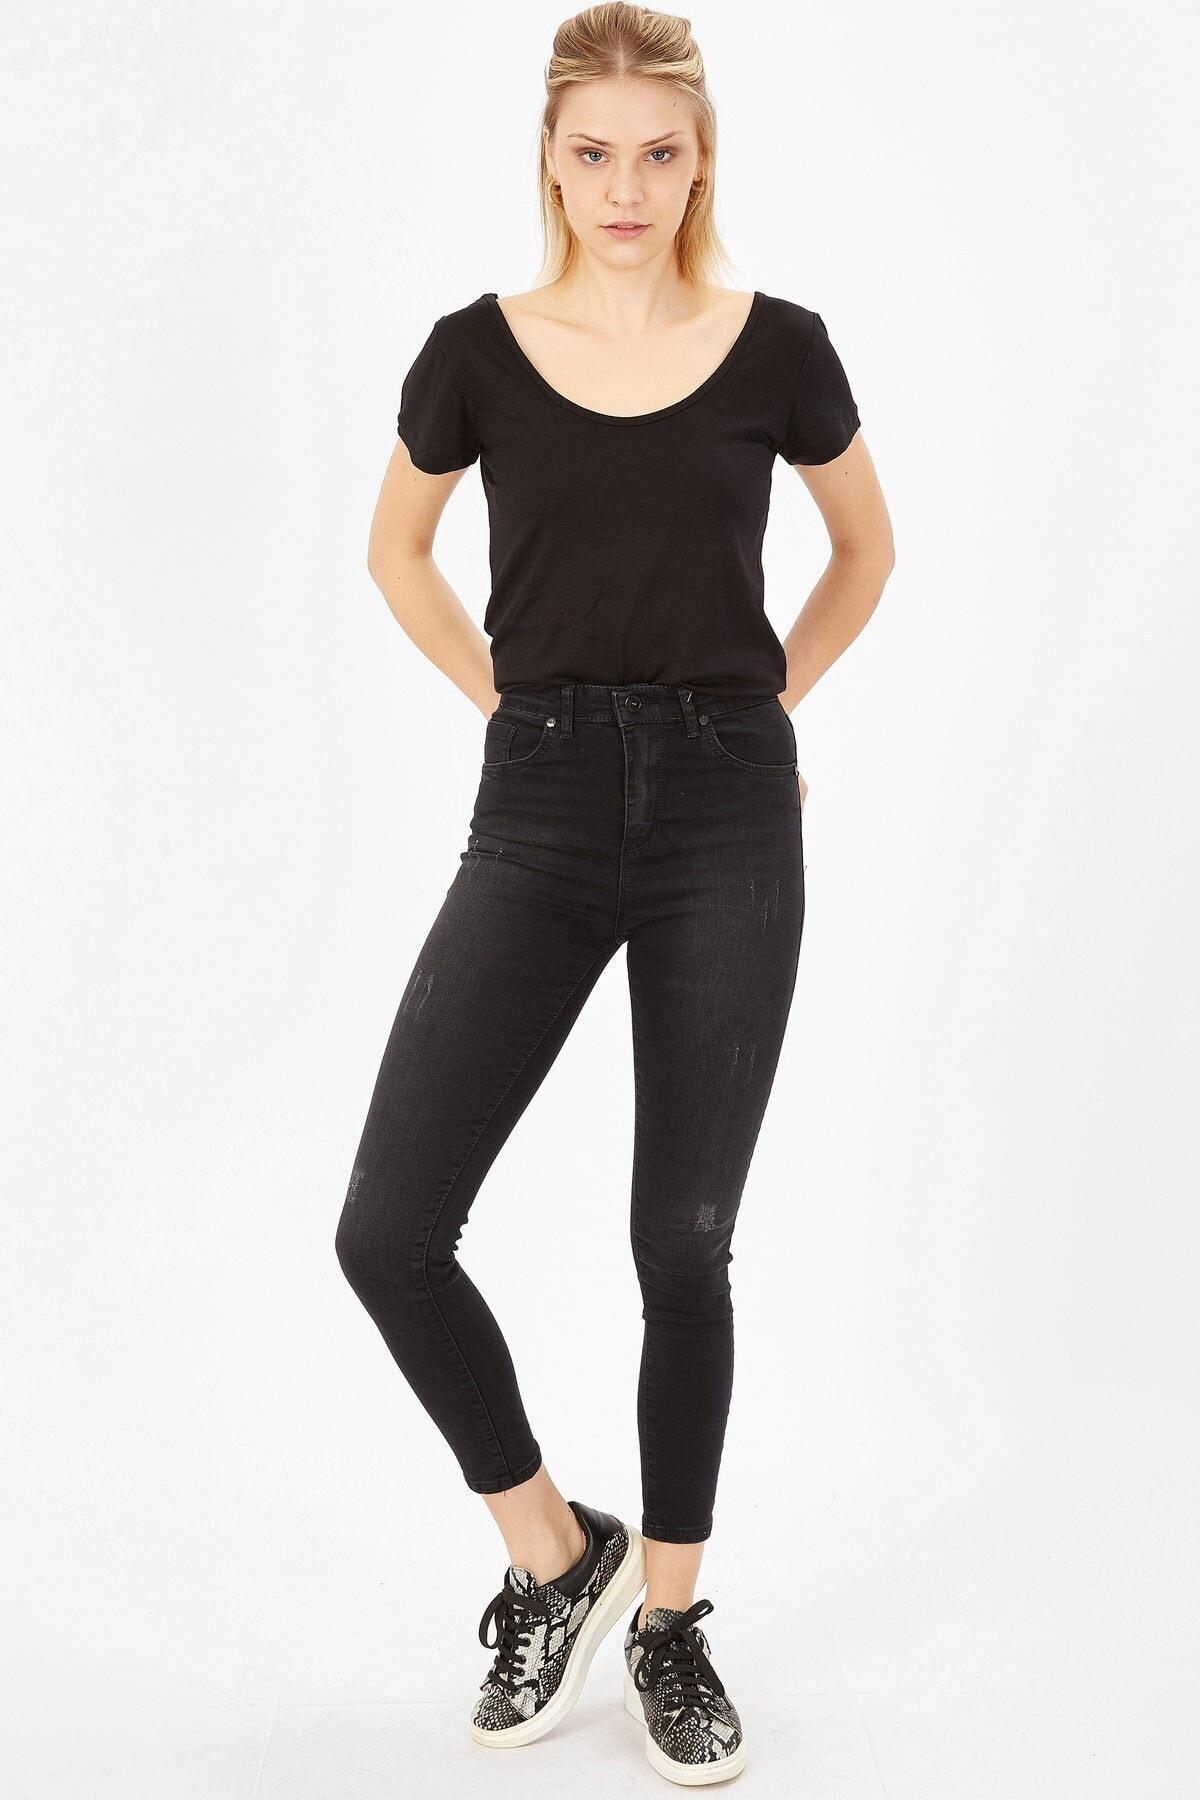 Arma Life Taşlanmış Lazerli Yüksek Bel Likralı Pantolon - Taşlanmış Siyah 1